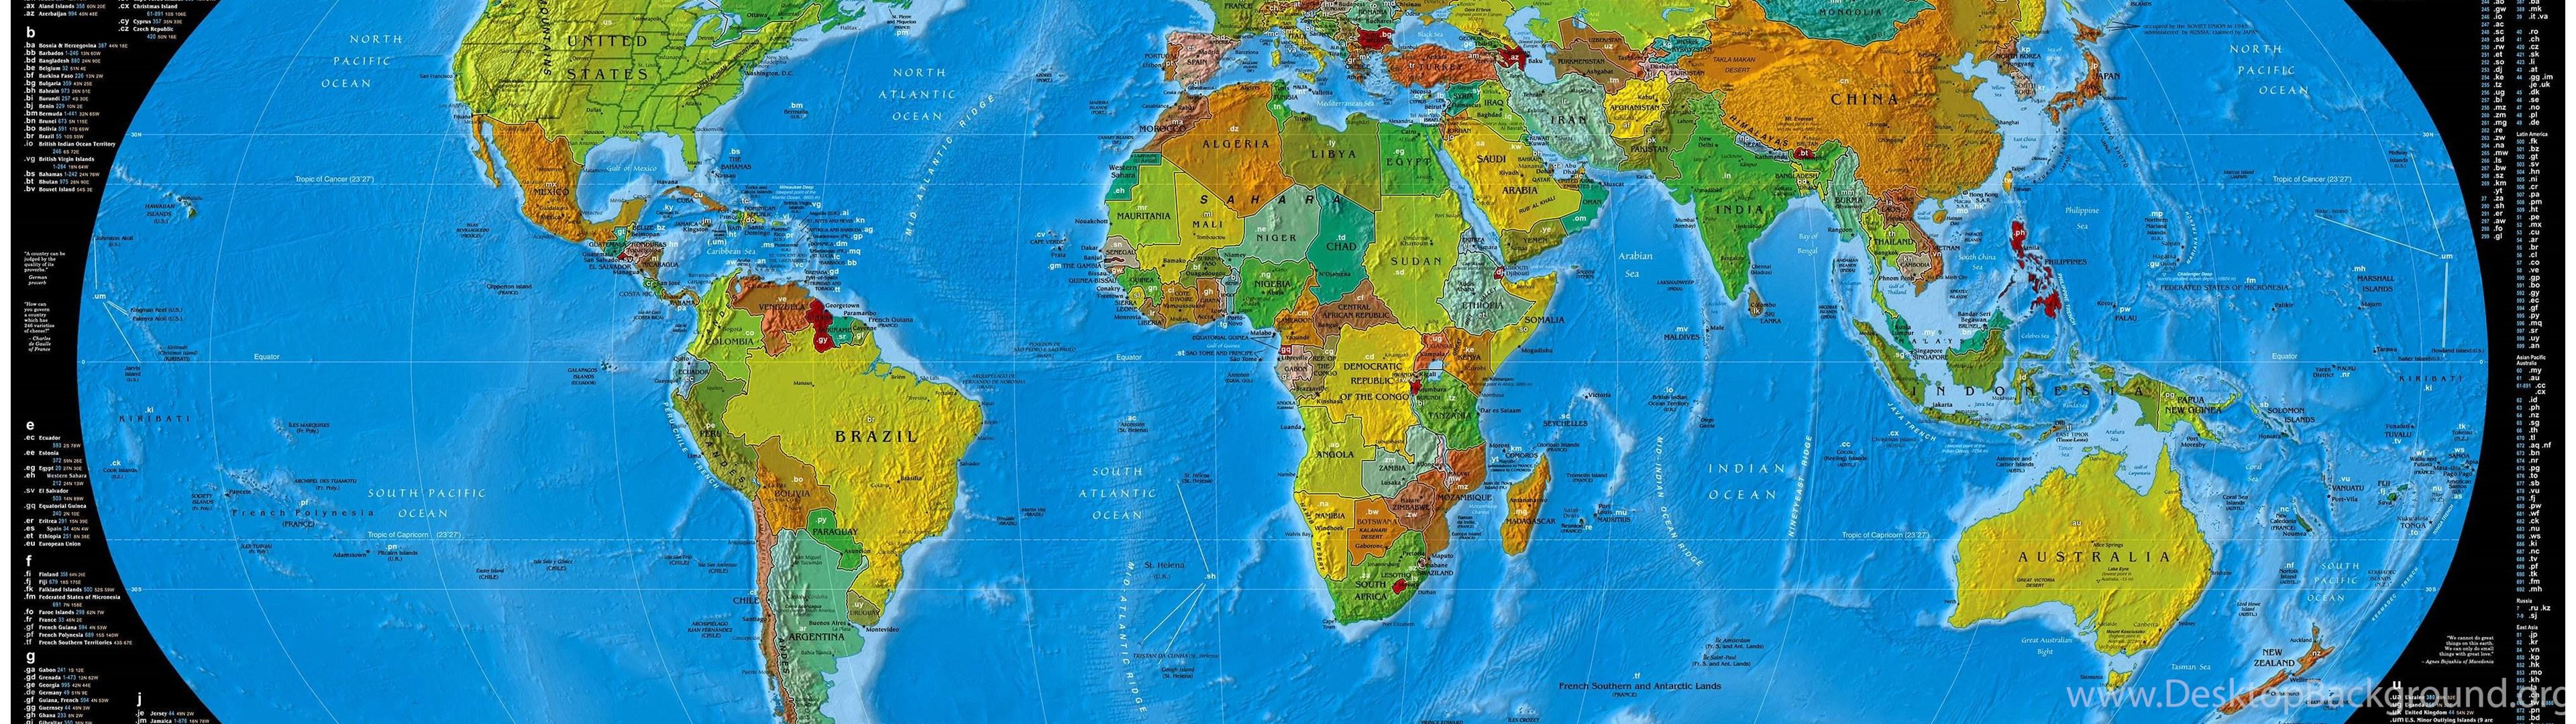 World map wallpapers desktop background widescreen gumiabroncs Choice Image